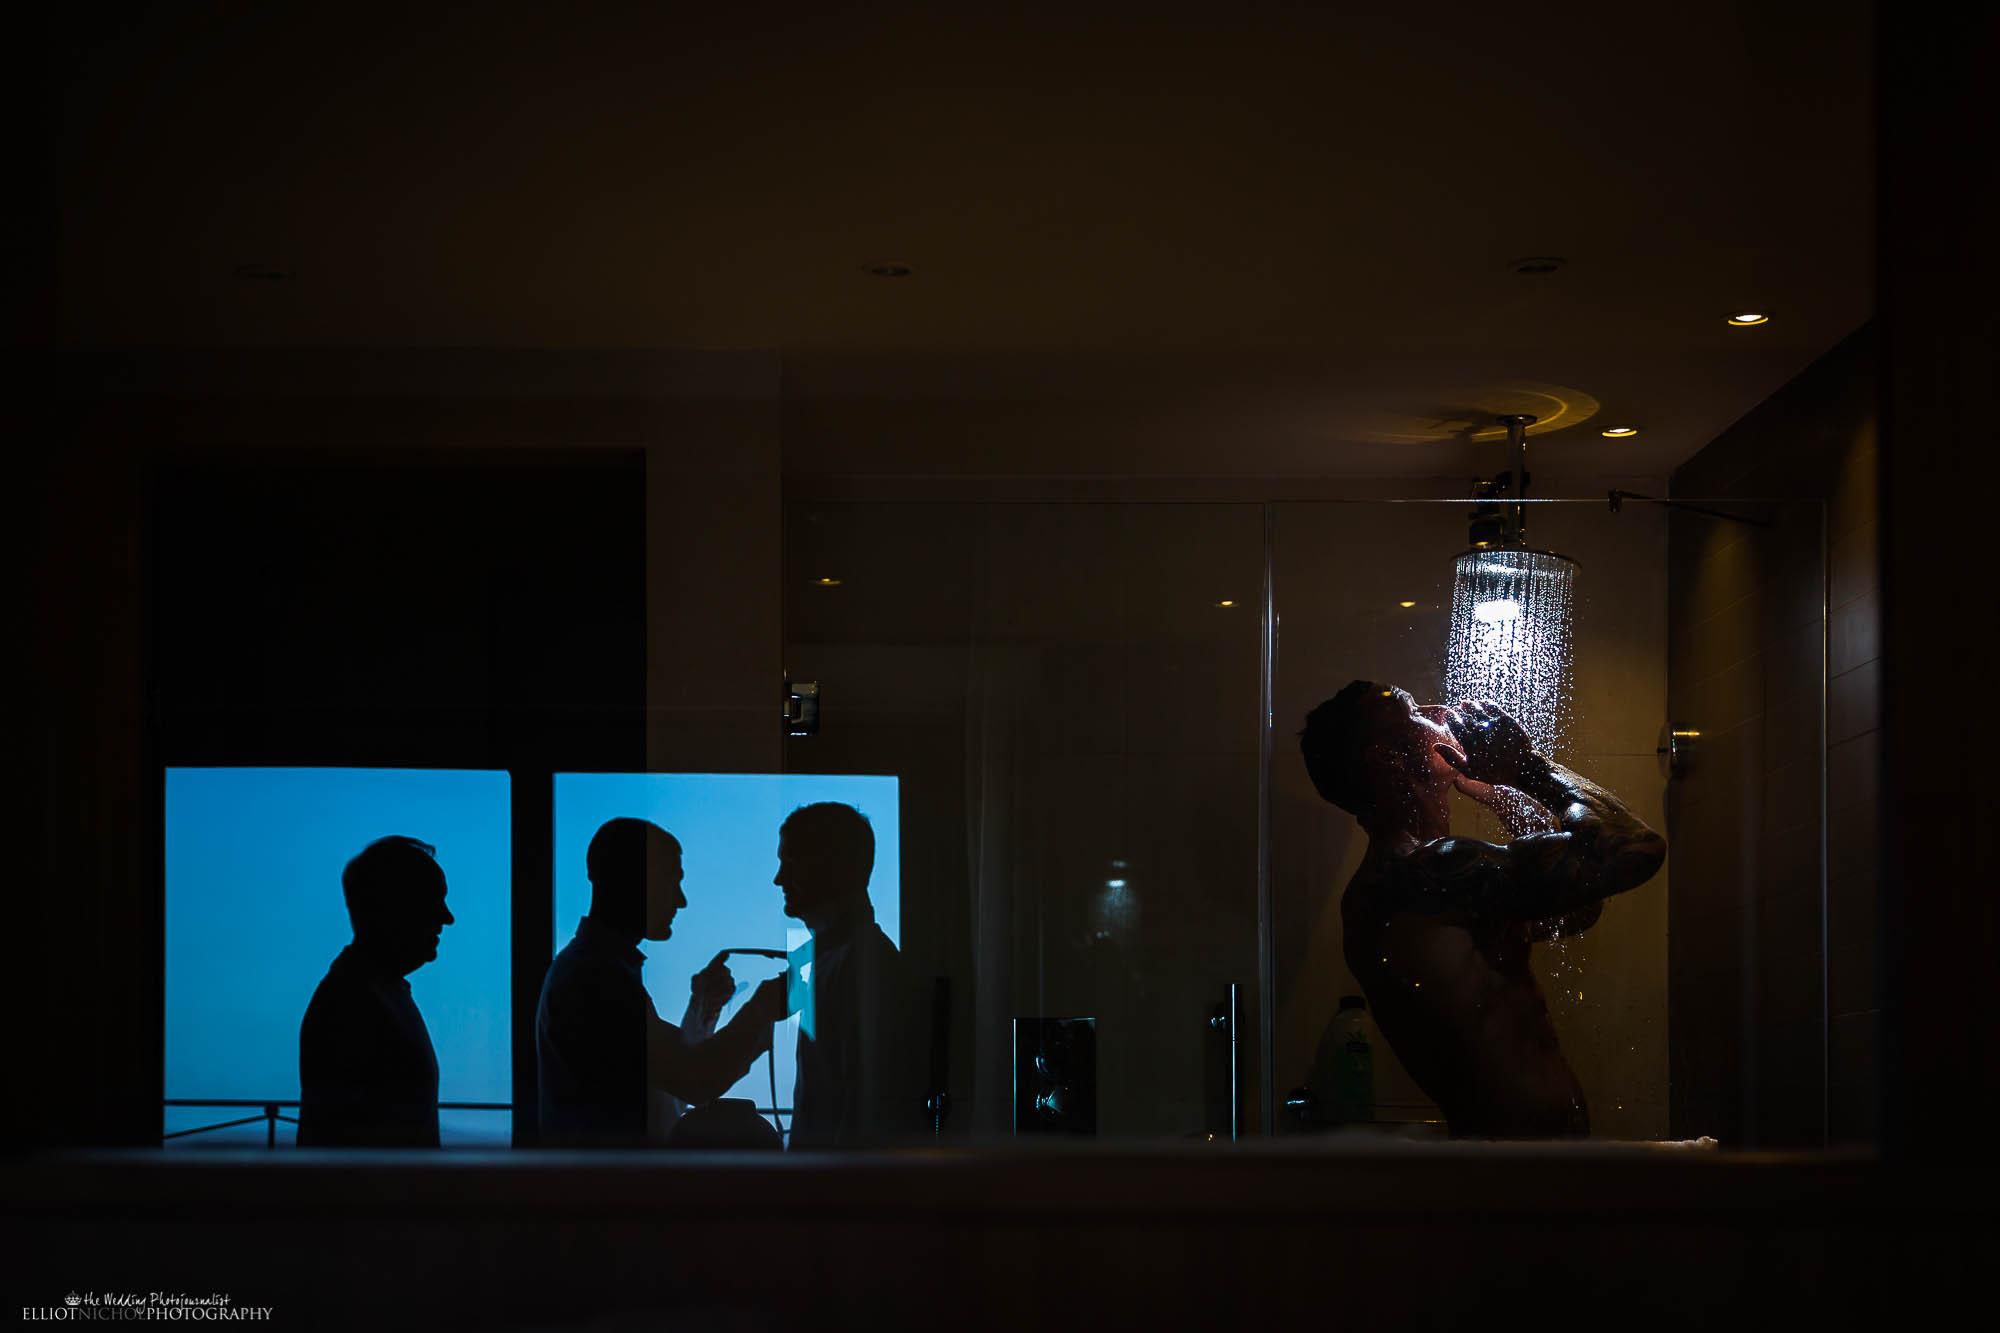 Showering Groom from Bexleyheath in Kent getting ready with his Groomsmen on his wedding day. Newcastle Upon Tyne based wedding photographer Elliot Nichol.